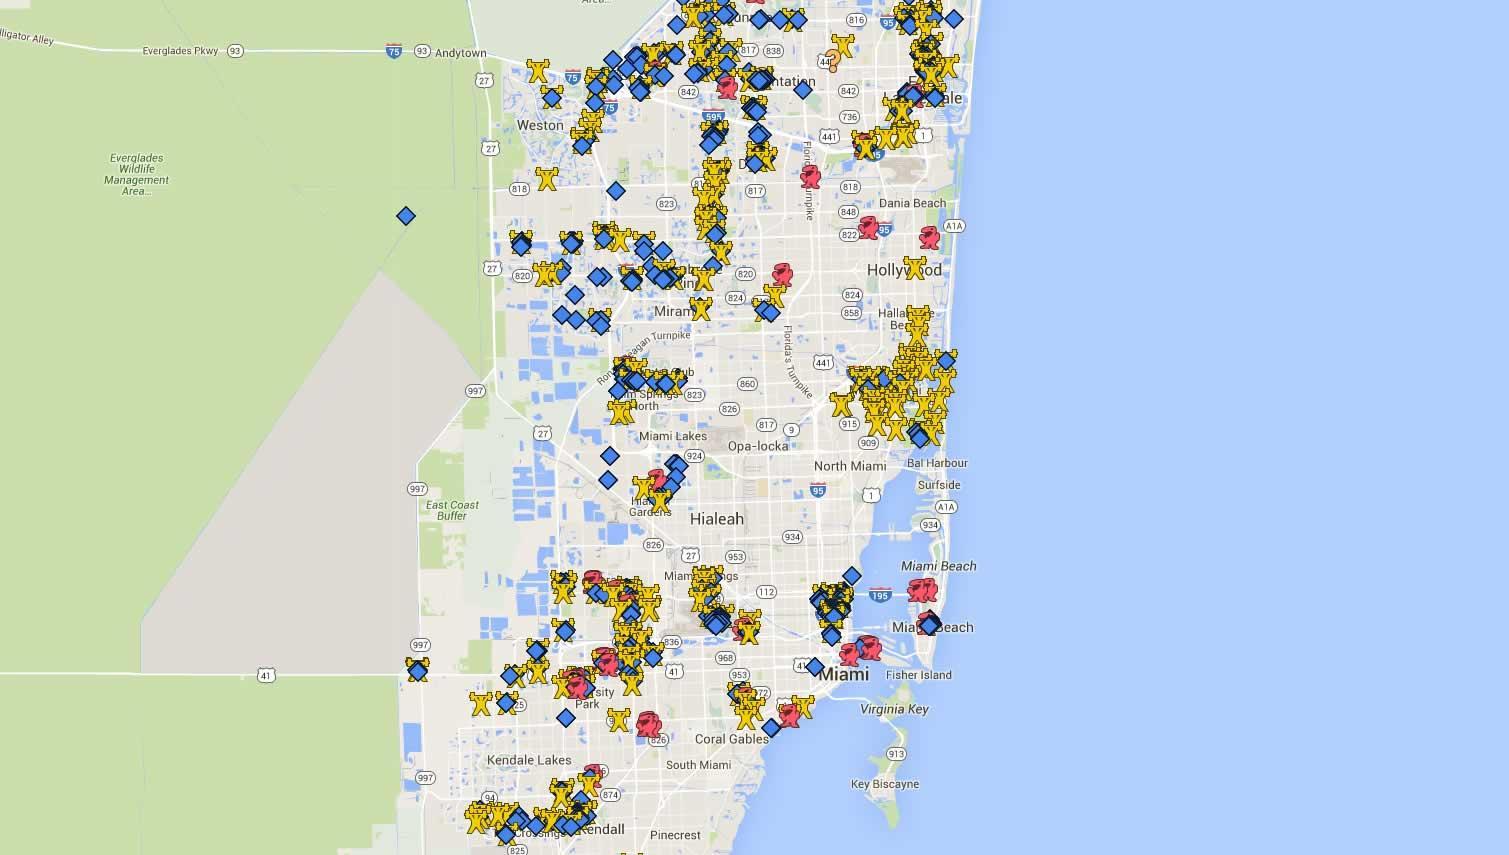 Map Of Jacksonville Florida Zip Codes #730988 - Florida Pokemon Go Map